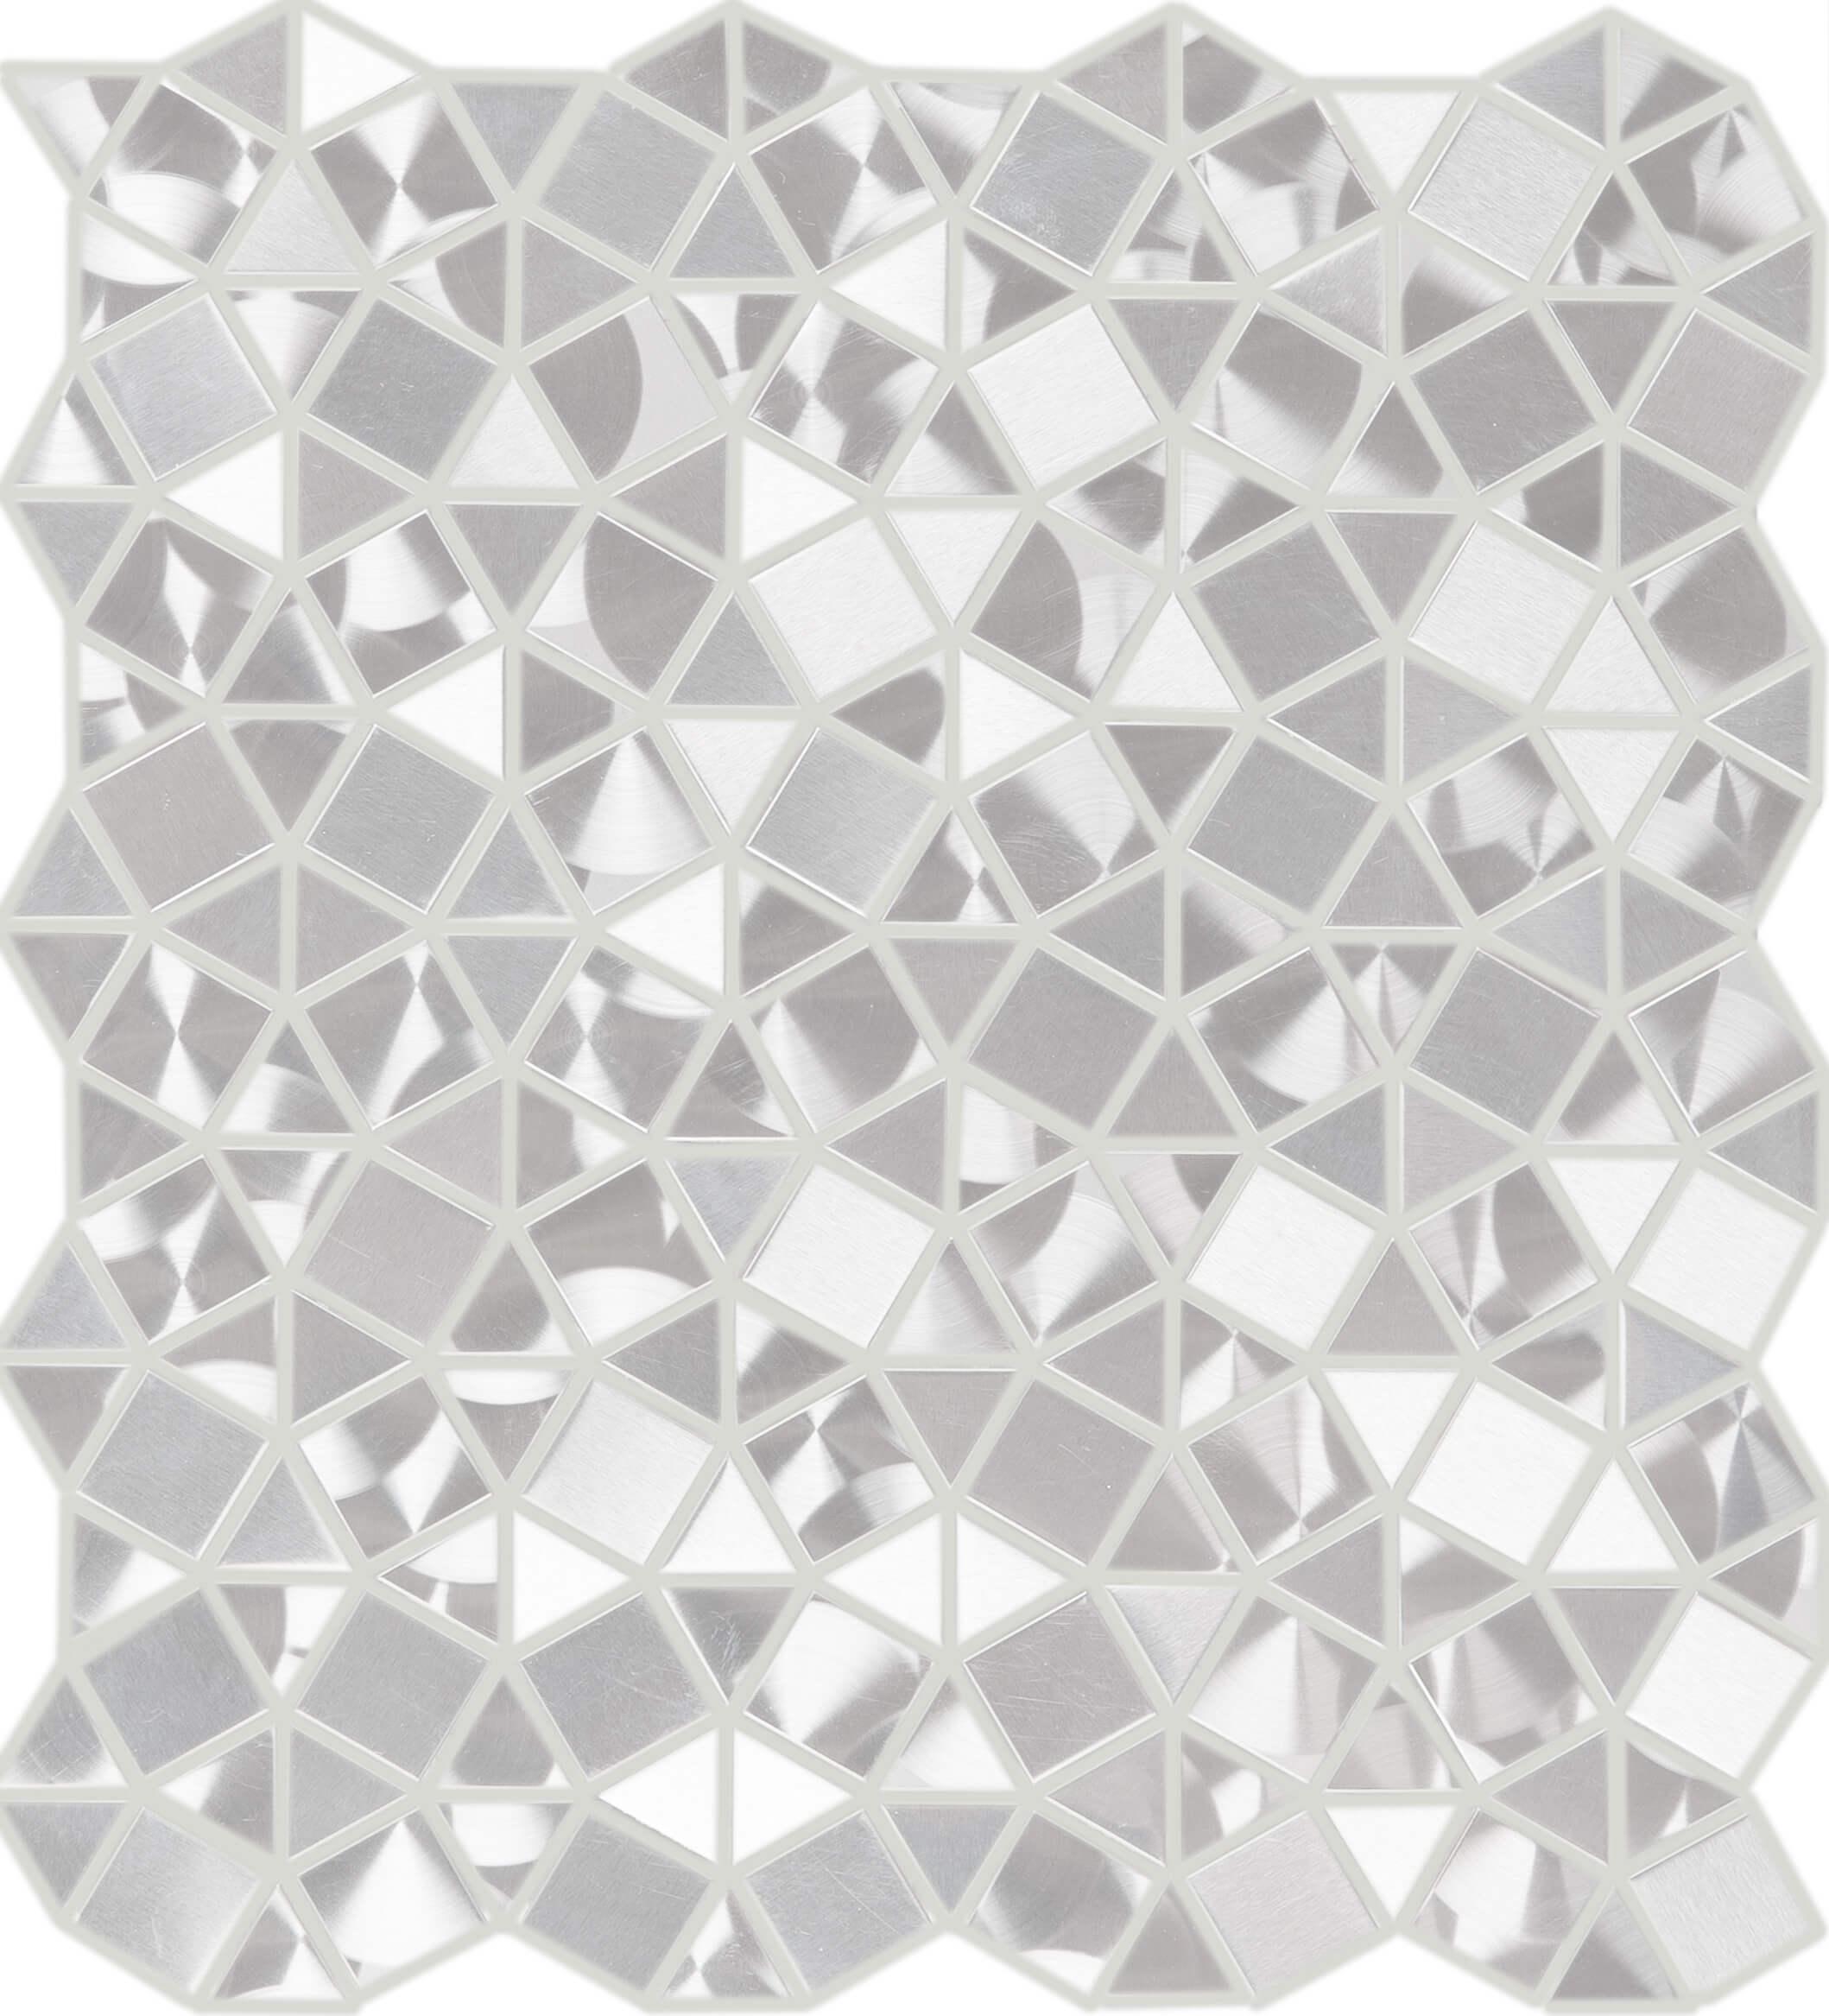 Metallix Miscellaneous Designs – Stainless SteelGeometrix